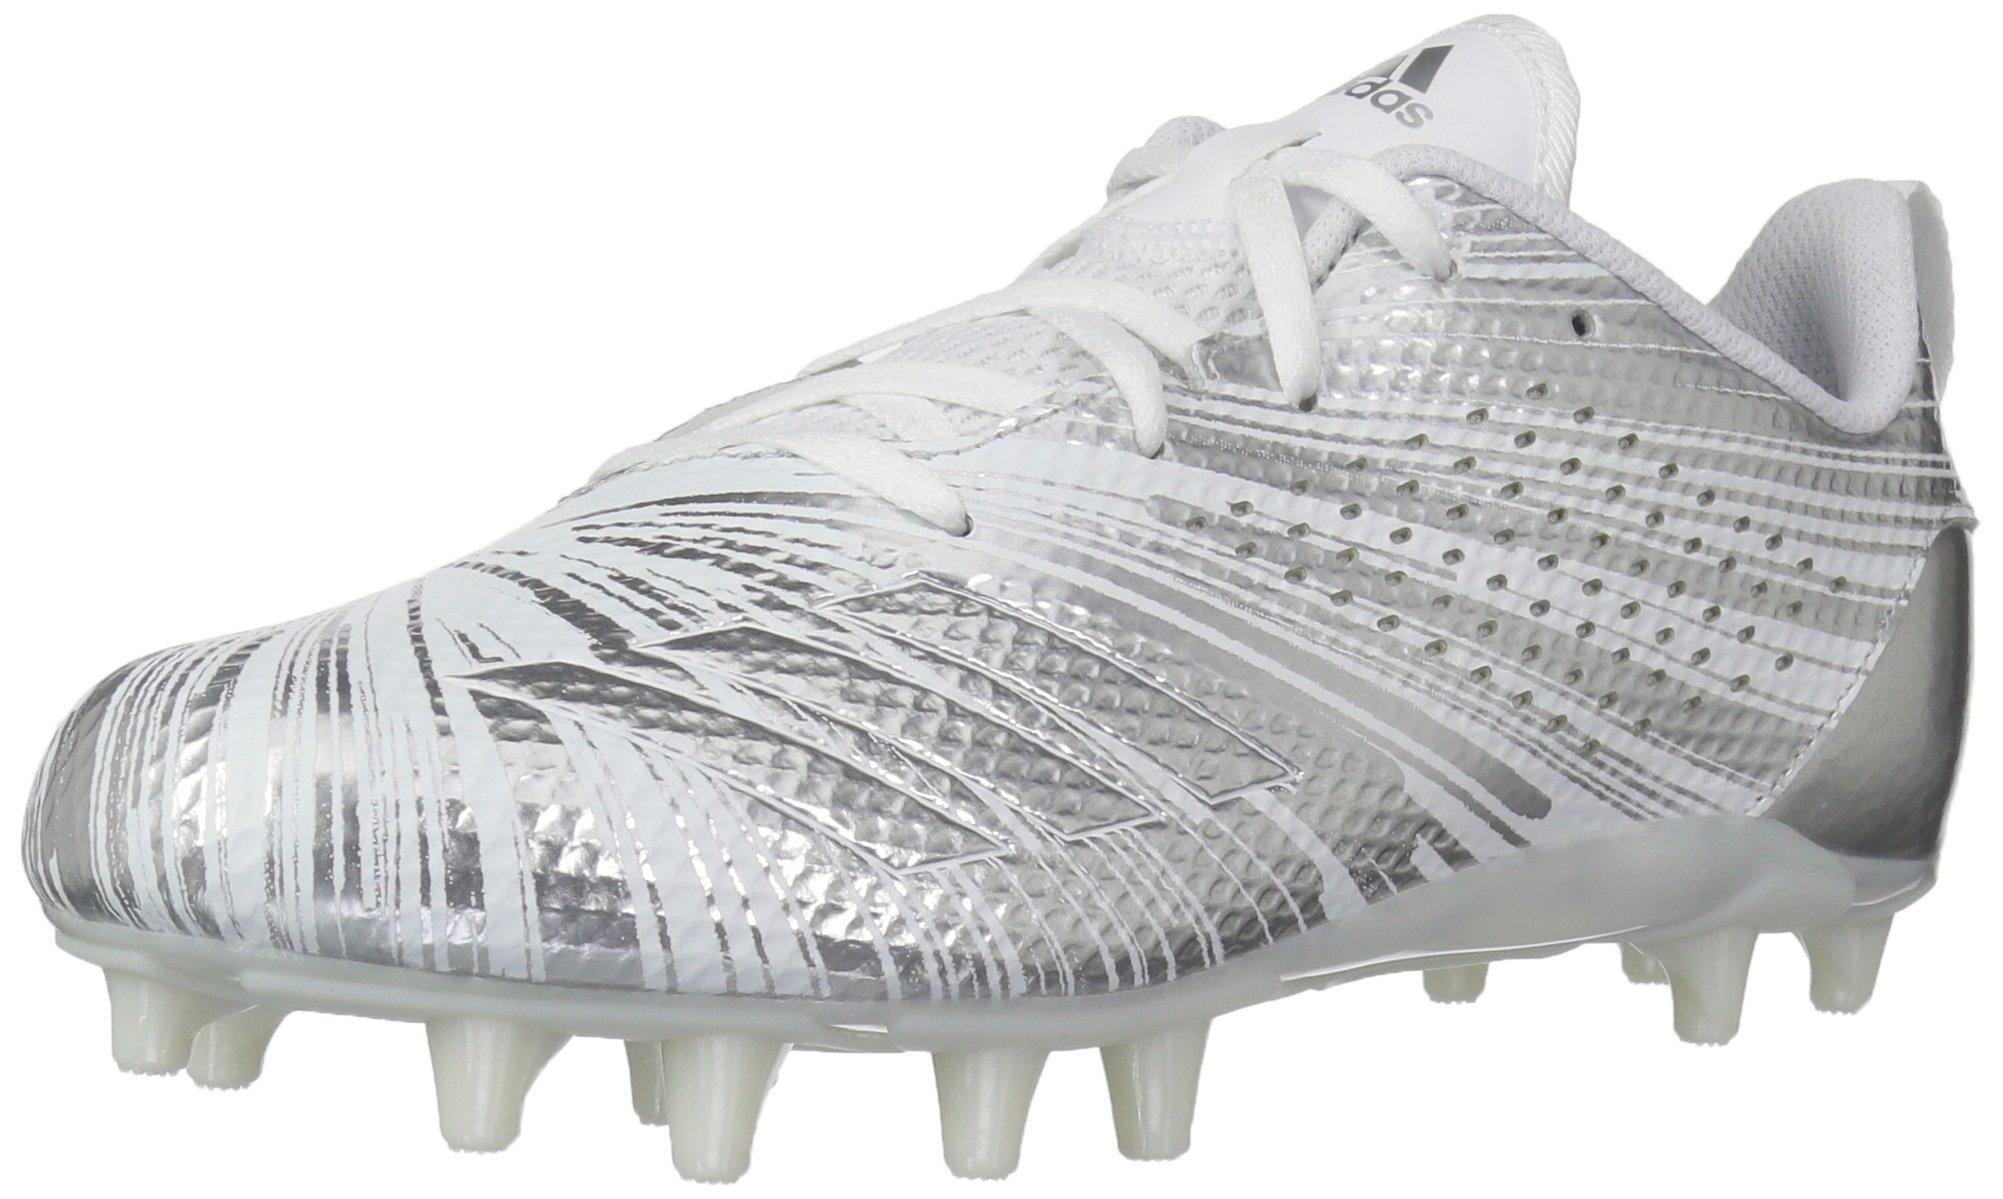 adidas Boys' Adizero 5.5Star 7.0 Football Shoe, Silver Metallic/White, 2.5 M US Little Kid